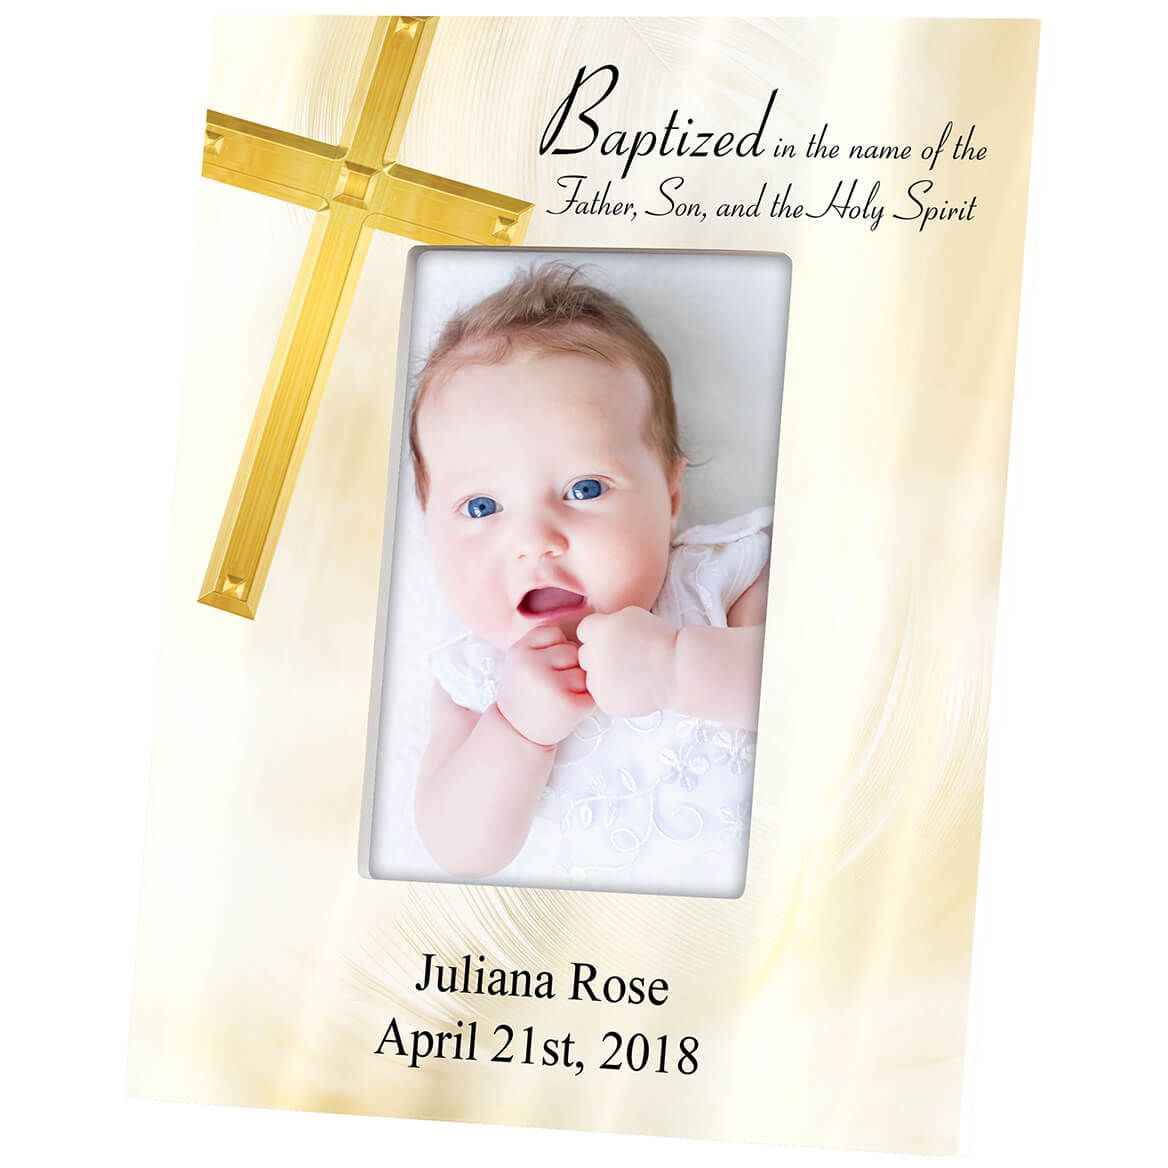 Personalized Baptism Frame-364634